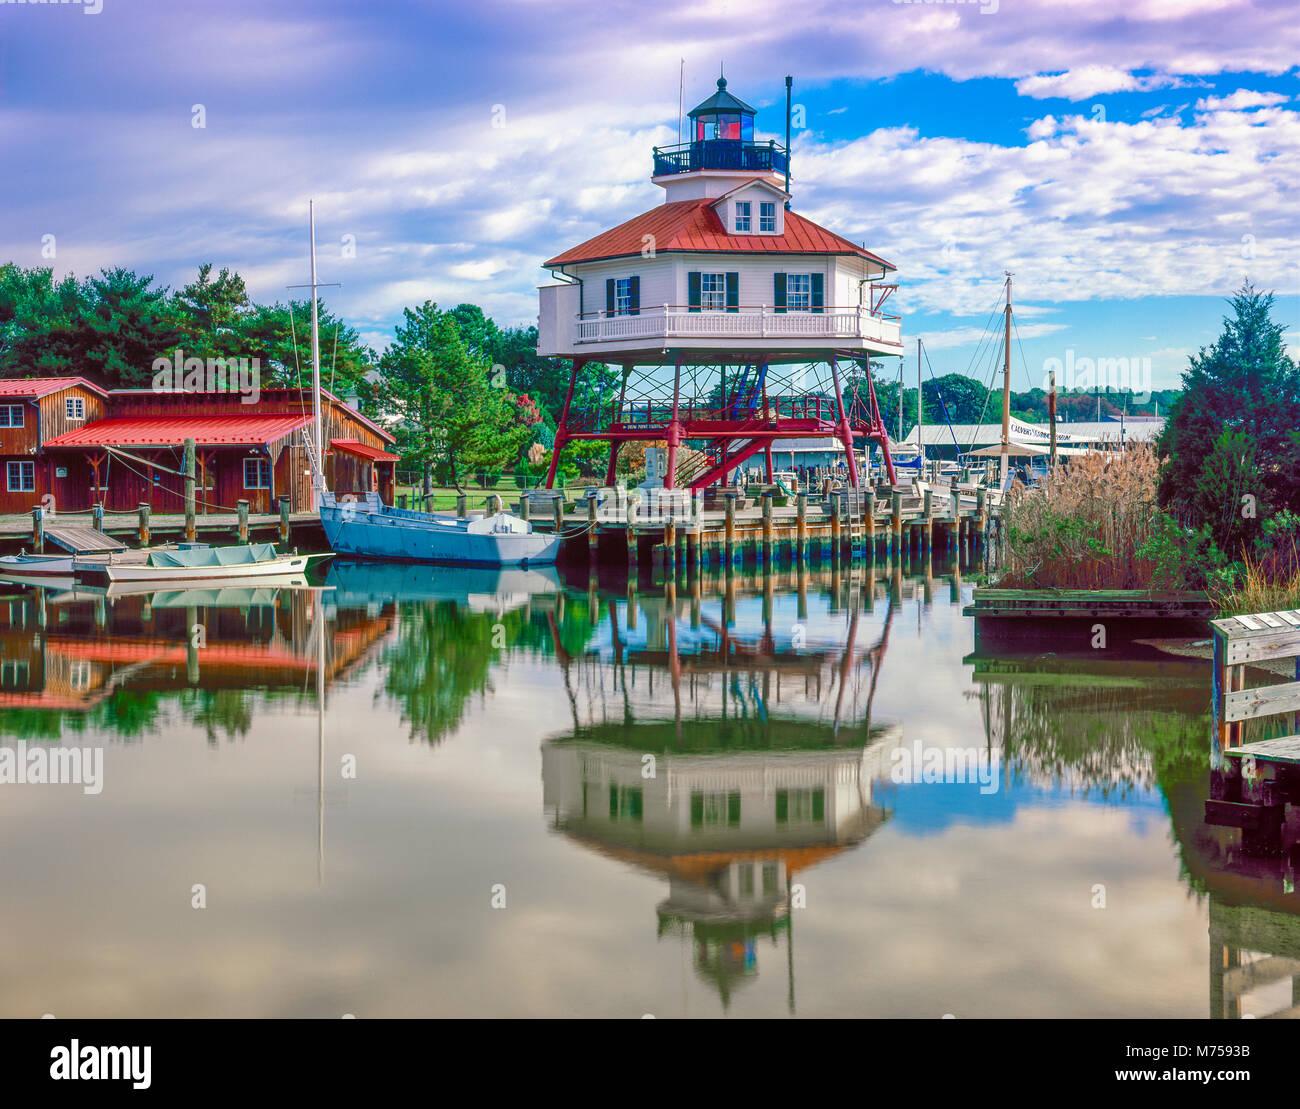 Punto di tamburo Liighthouse, Calvert, Maryland, Chesapeake Bay, costruito nel 1883 Foto Stock